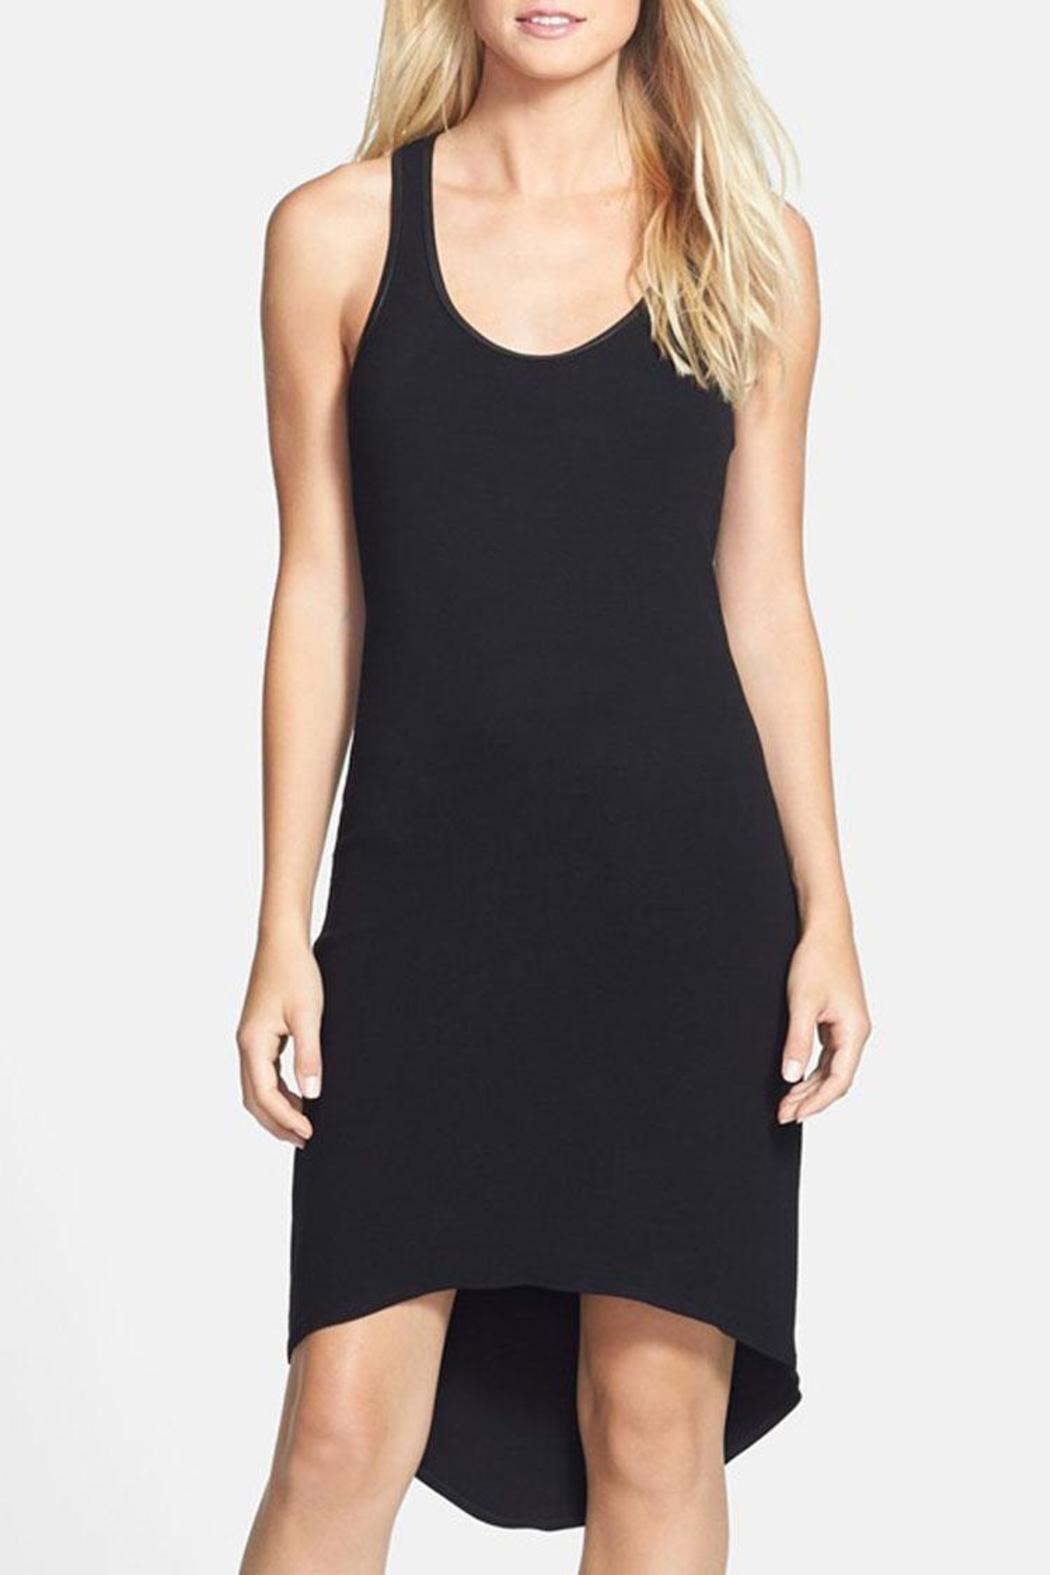 Onyx Racerback Dress Racerback Dress Dresses Black Dresses Casual [ 1575 x 1050 Pixel ]